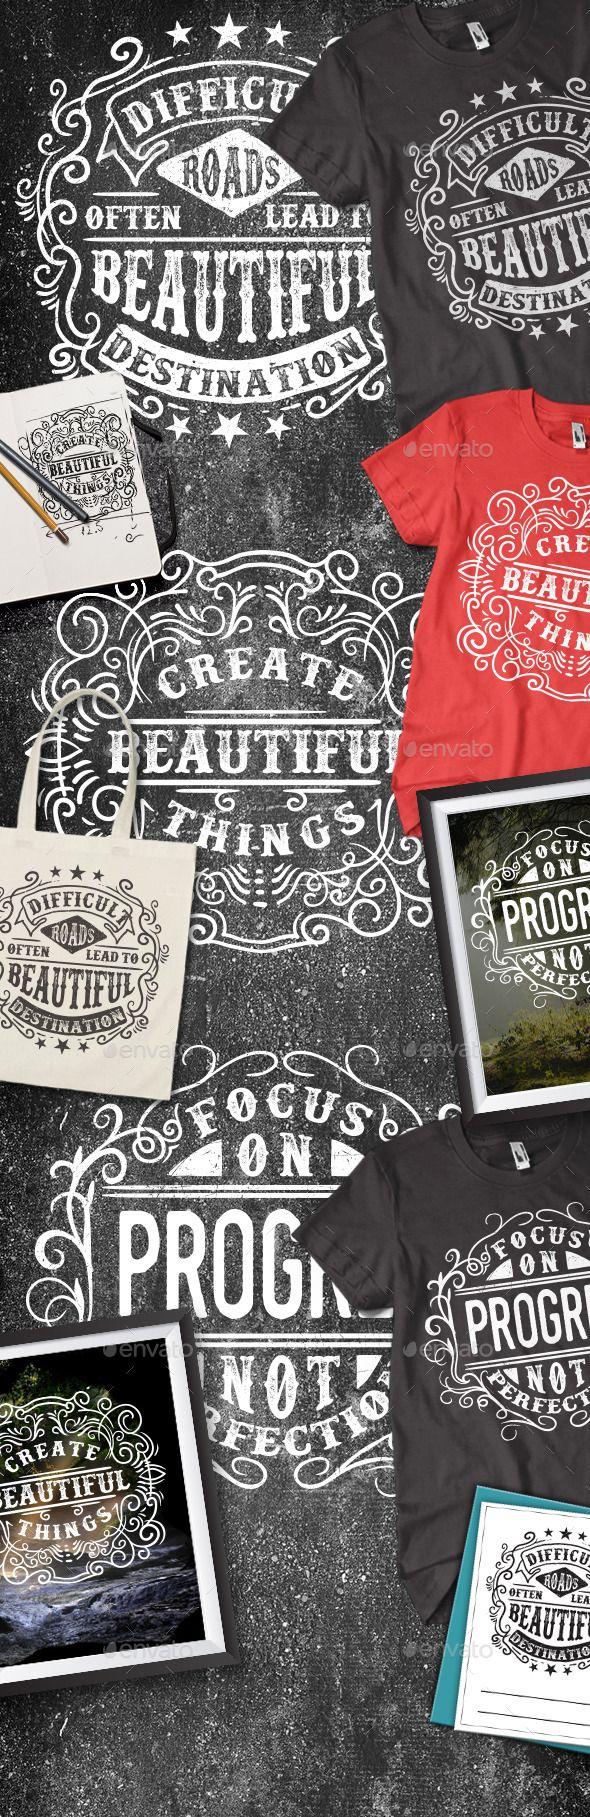 T shirt design download - 3 Typography T Shirt